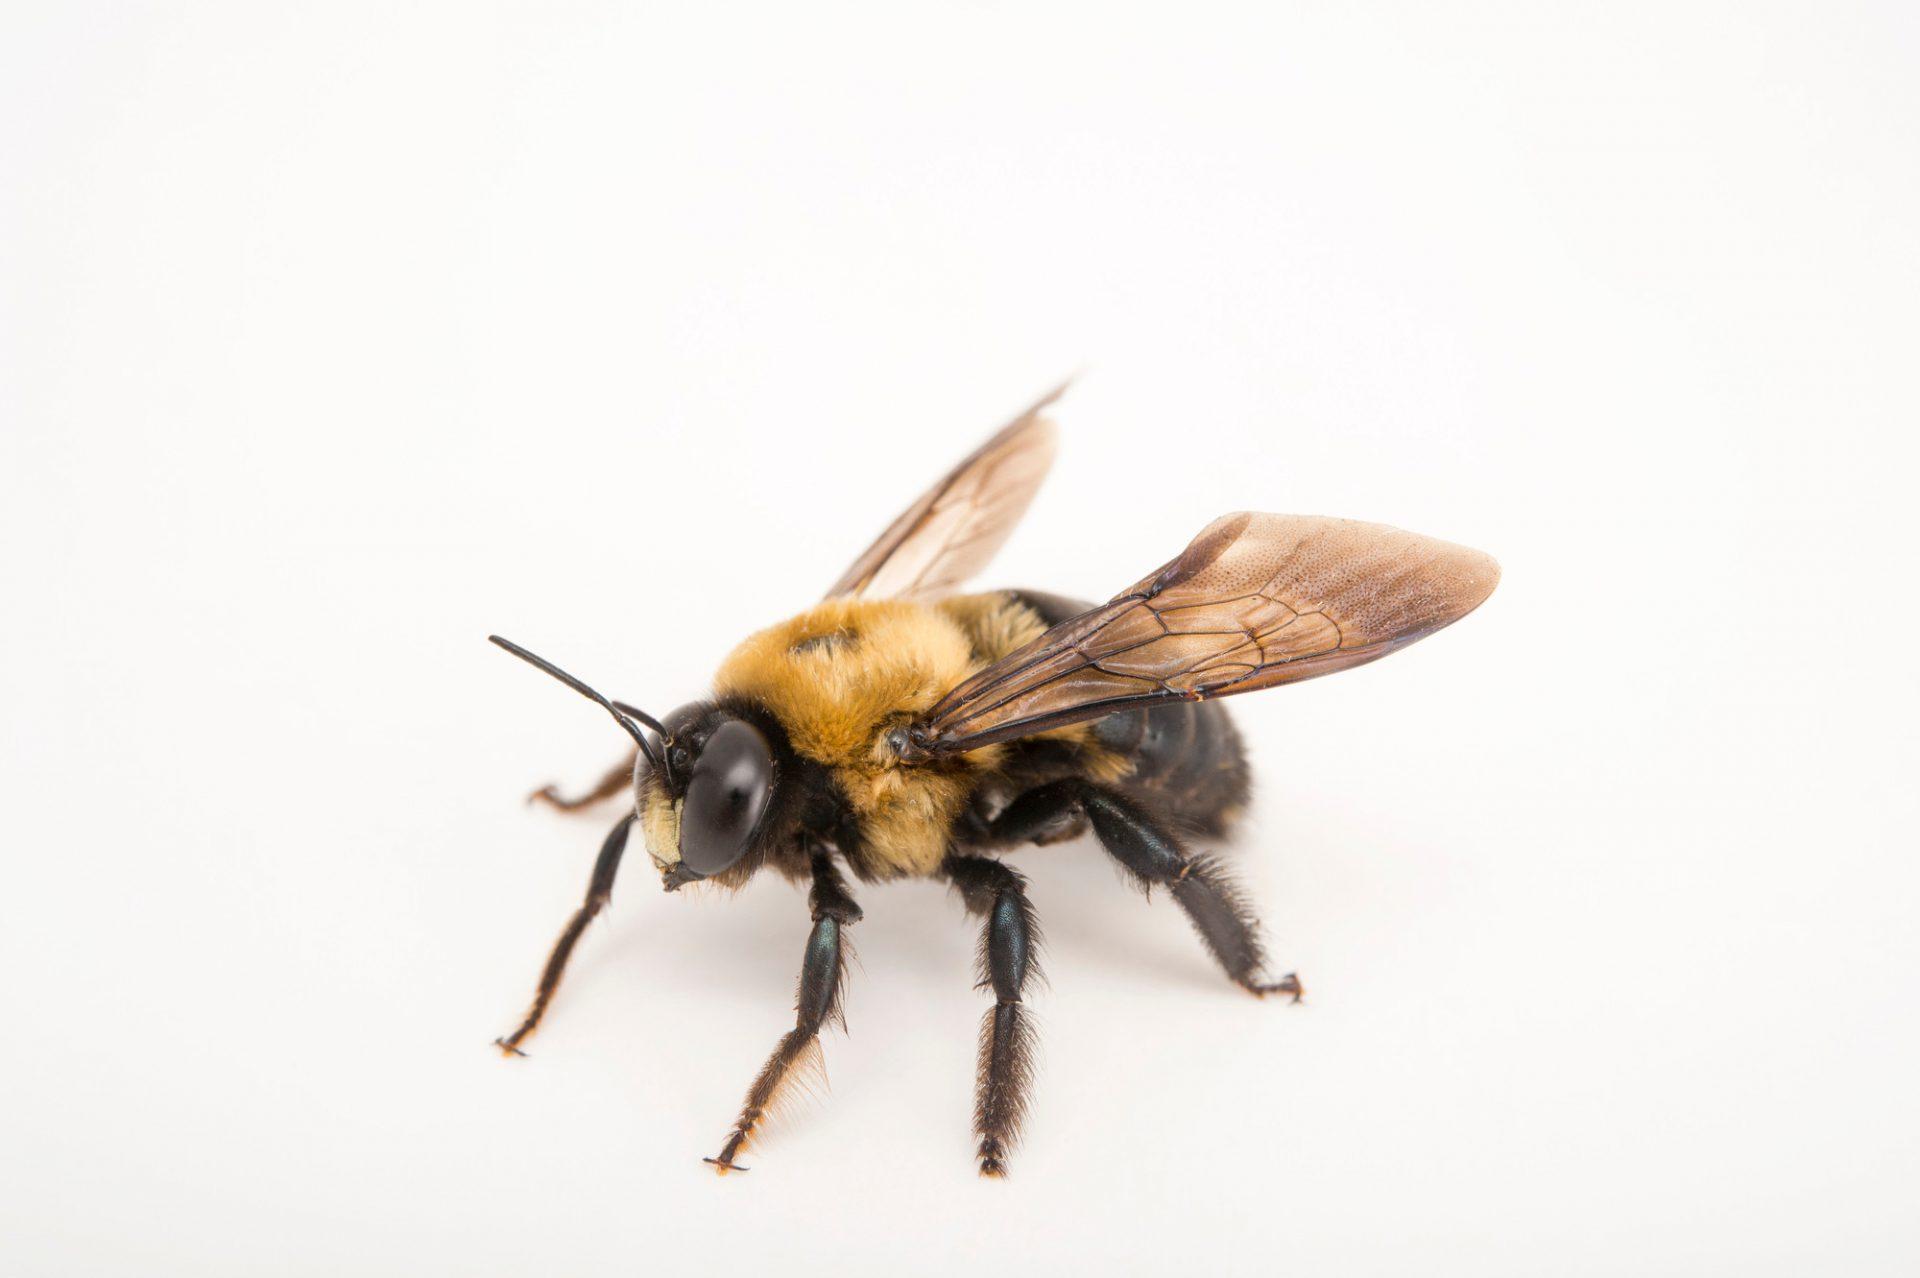 Carpenter bee (Xylocopa virginica virginica) at the St. Louis Zoo.